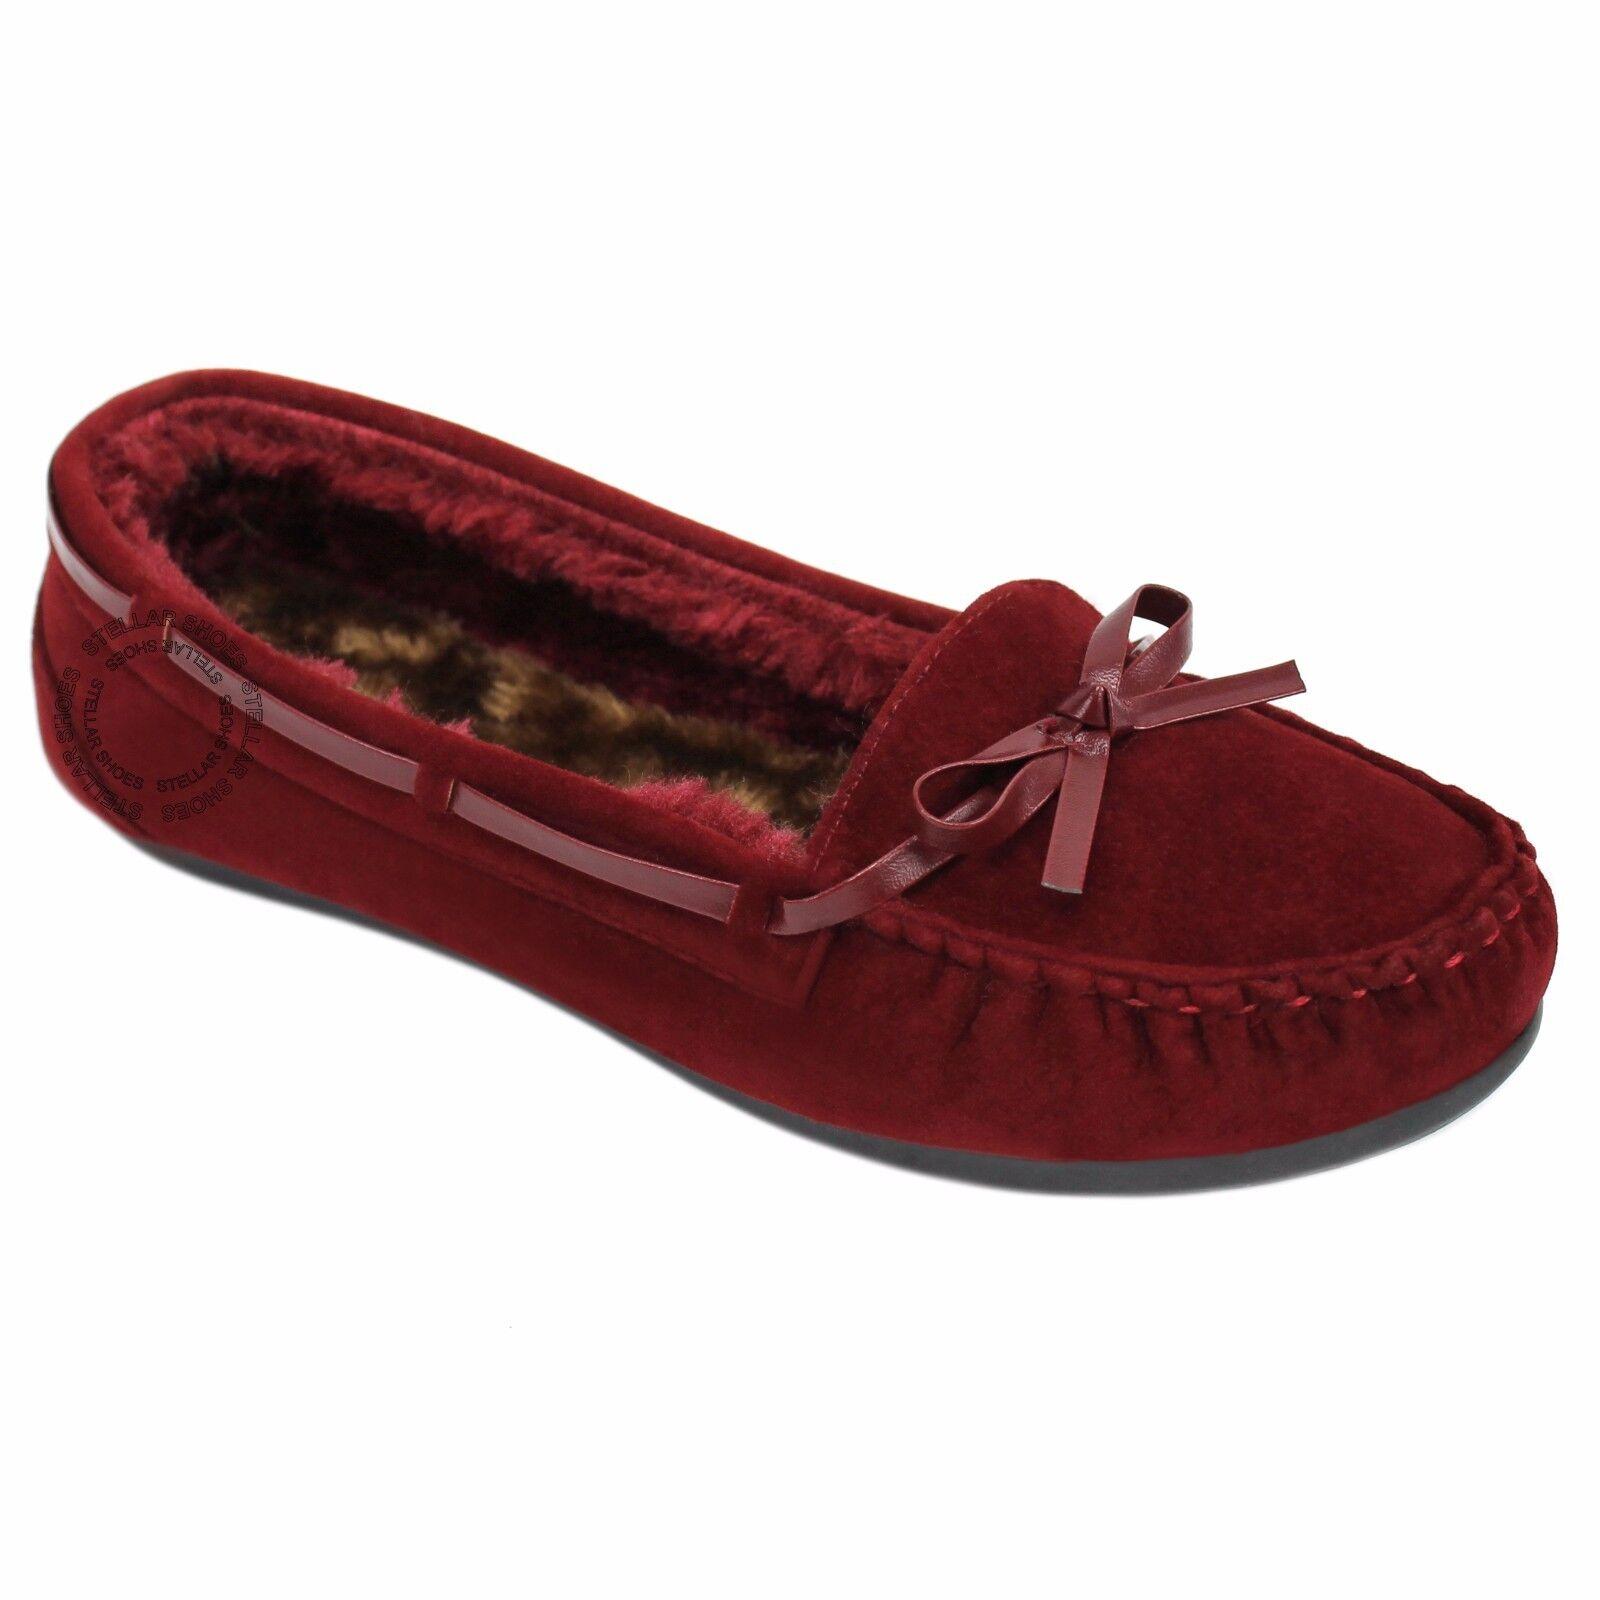 New Moccasins Women Slip On Indoor Outdoor Shoe Slipper Fur Loafer 5-10 Size